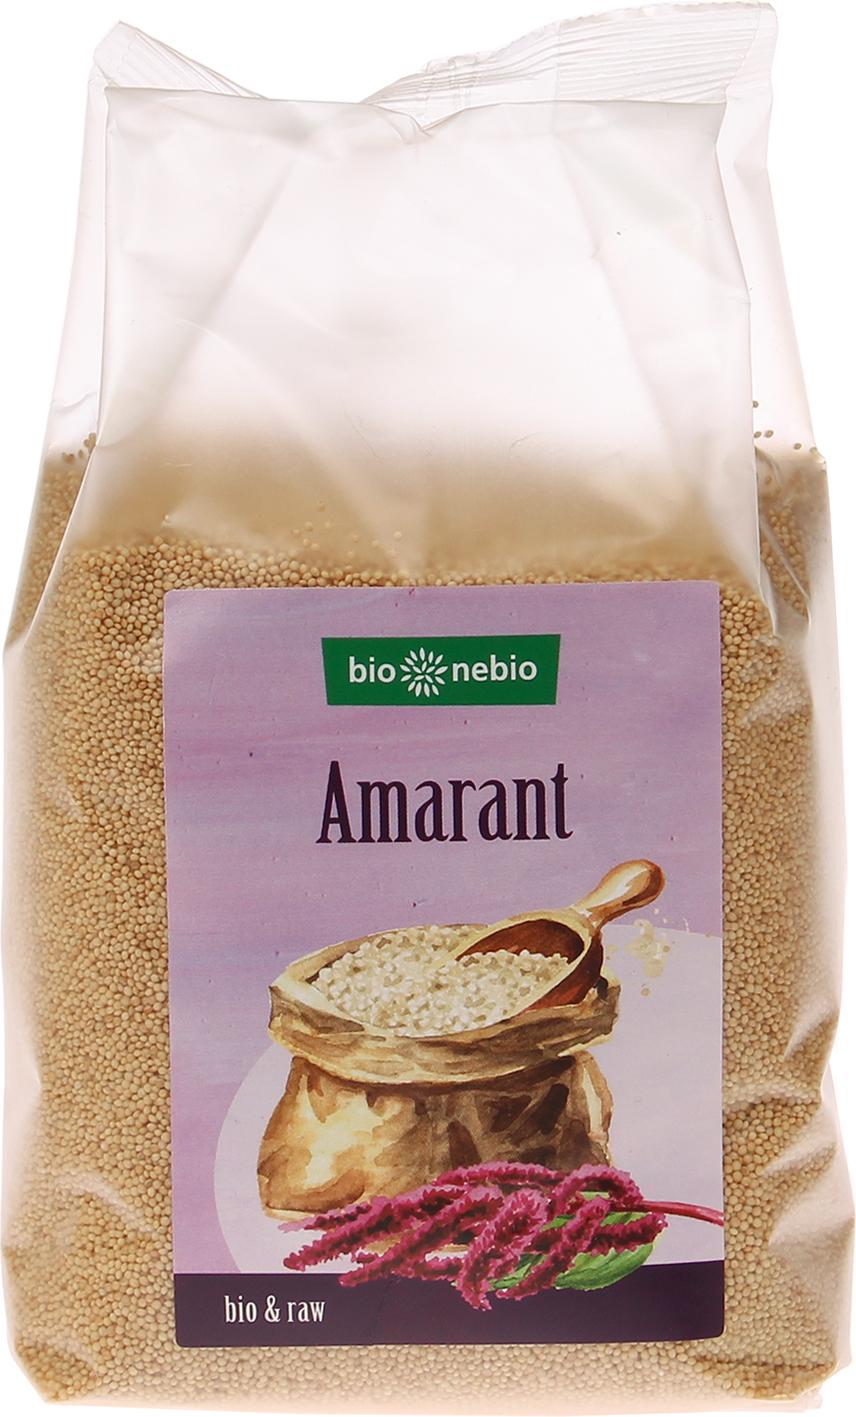 Bio amarant bio*nebio 500 g